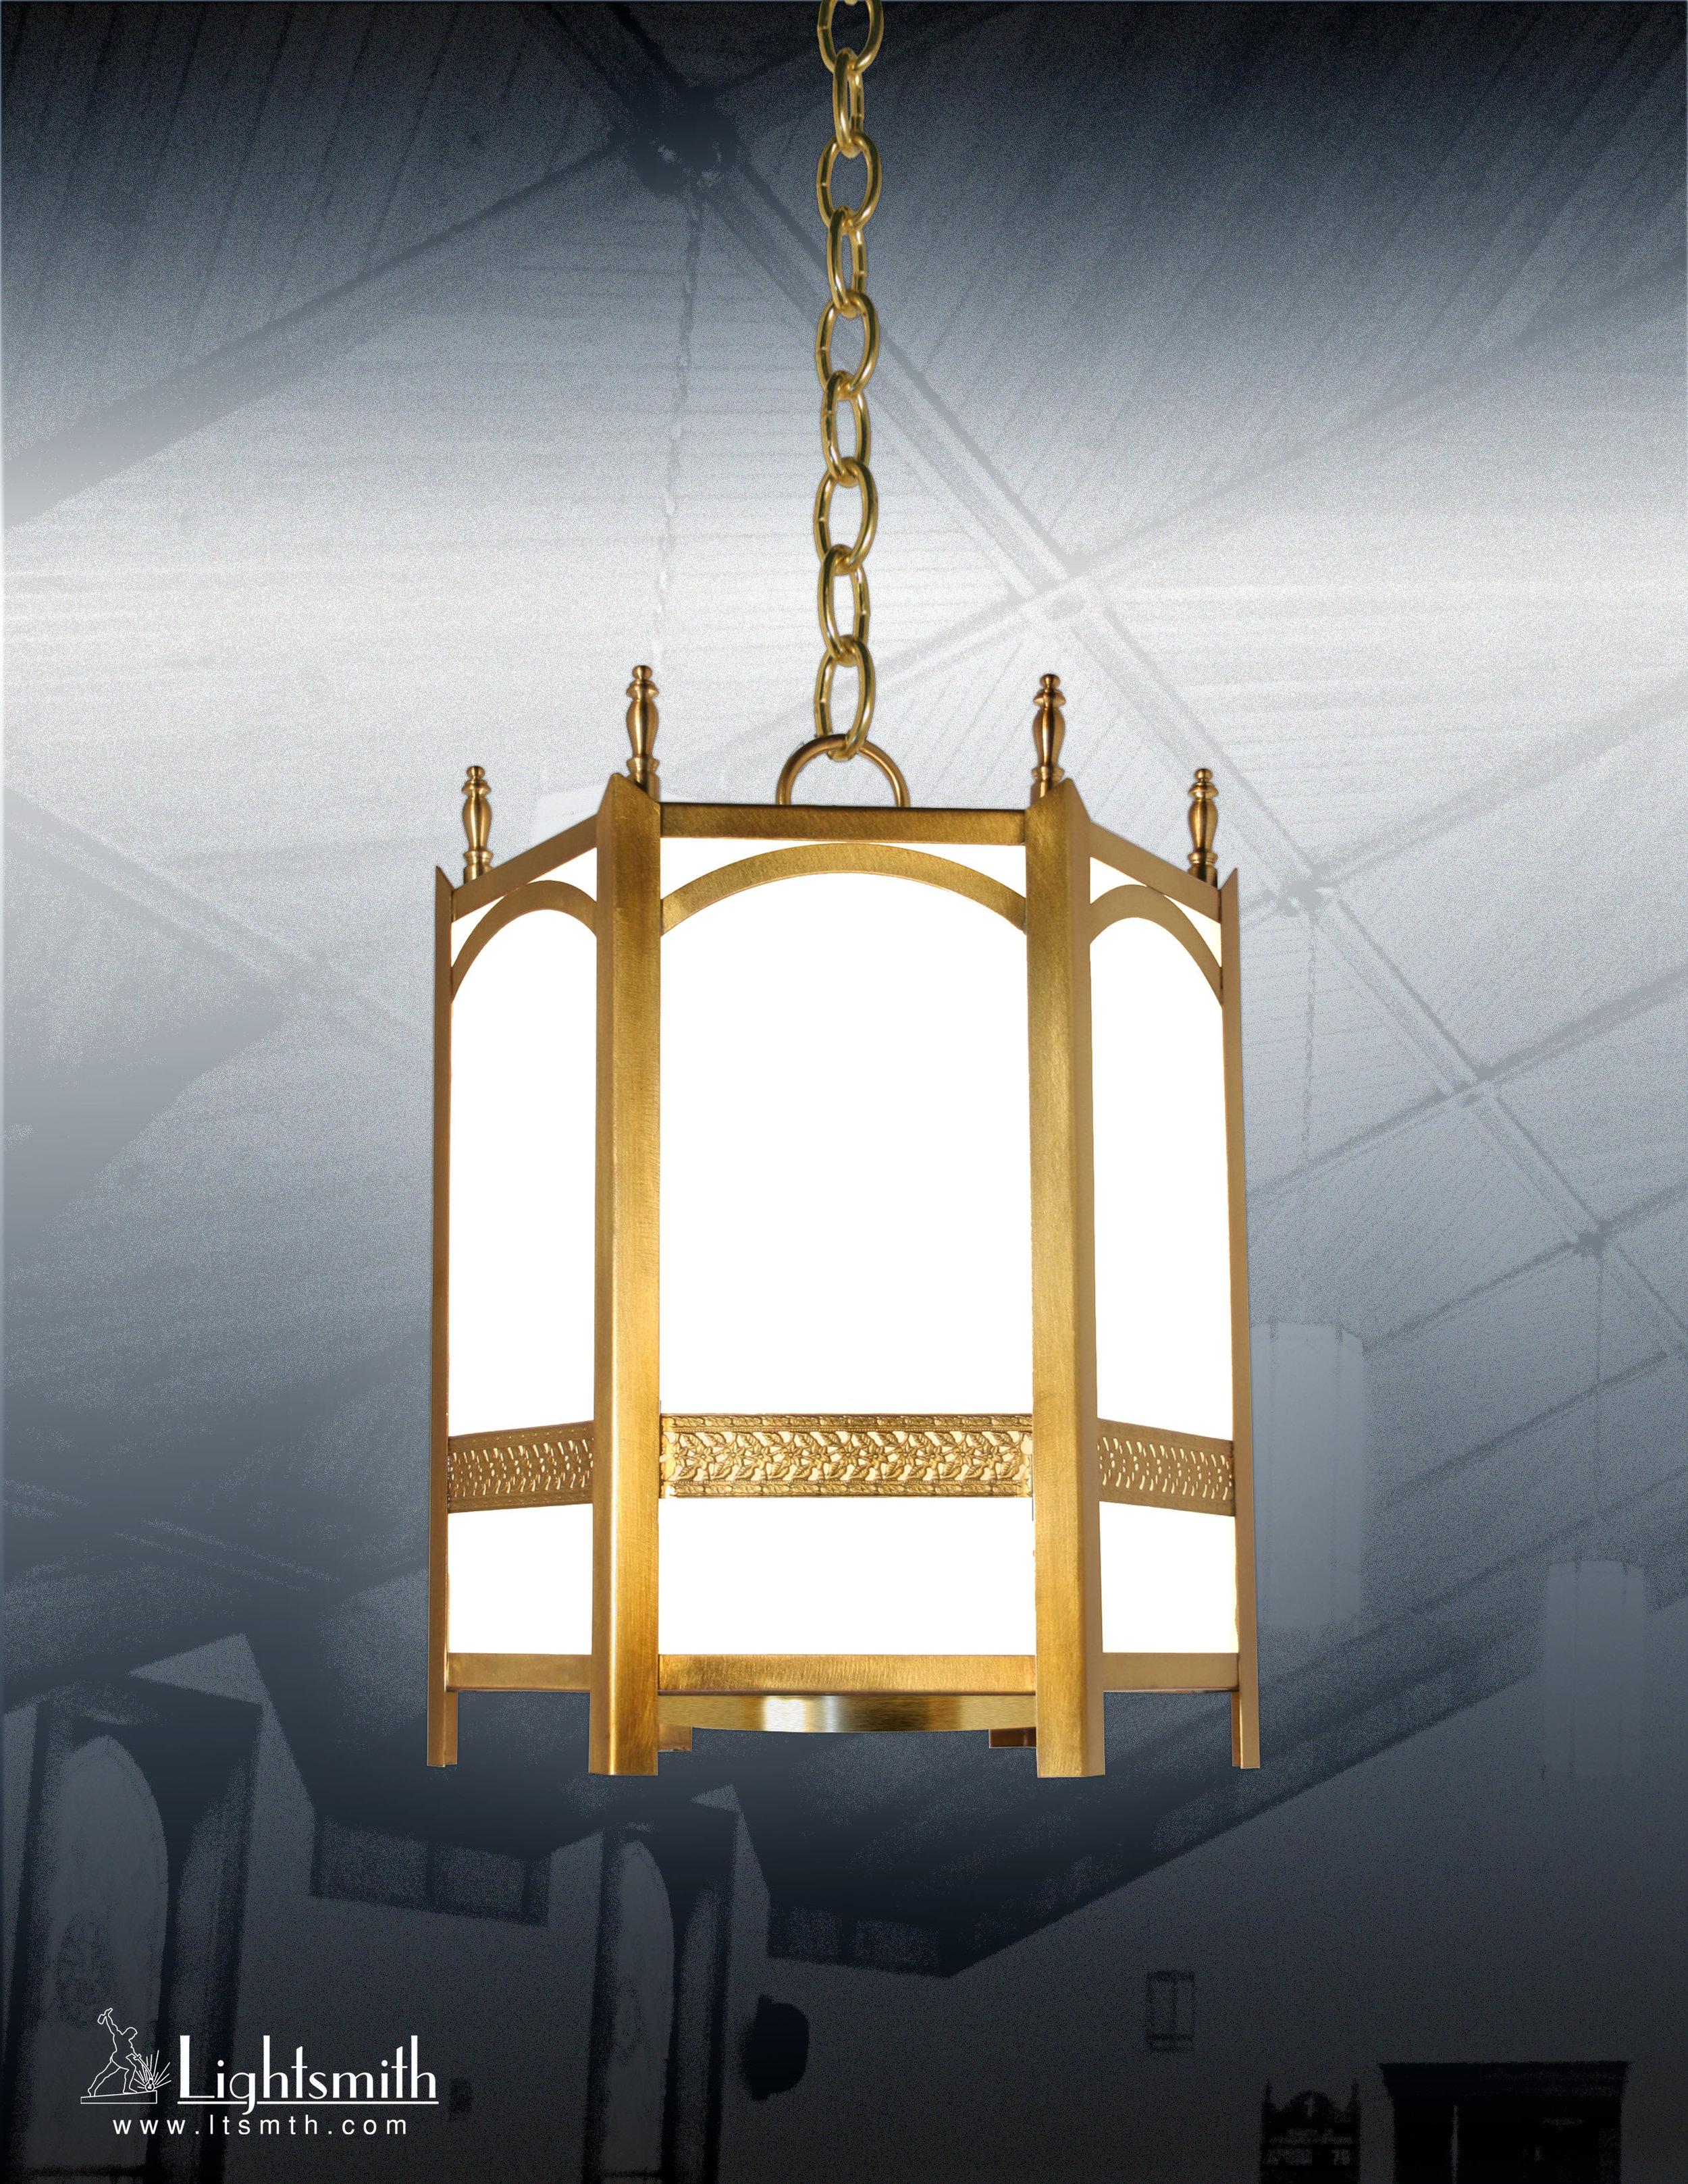 312-ST -Satin Brass - White Opal Glass